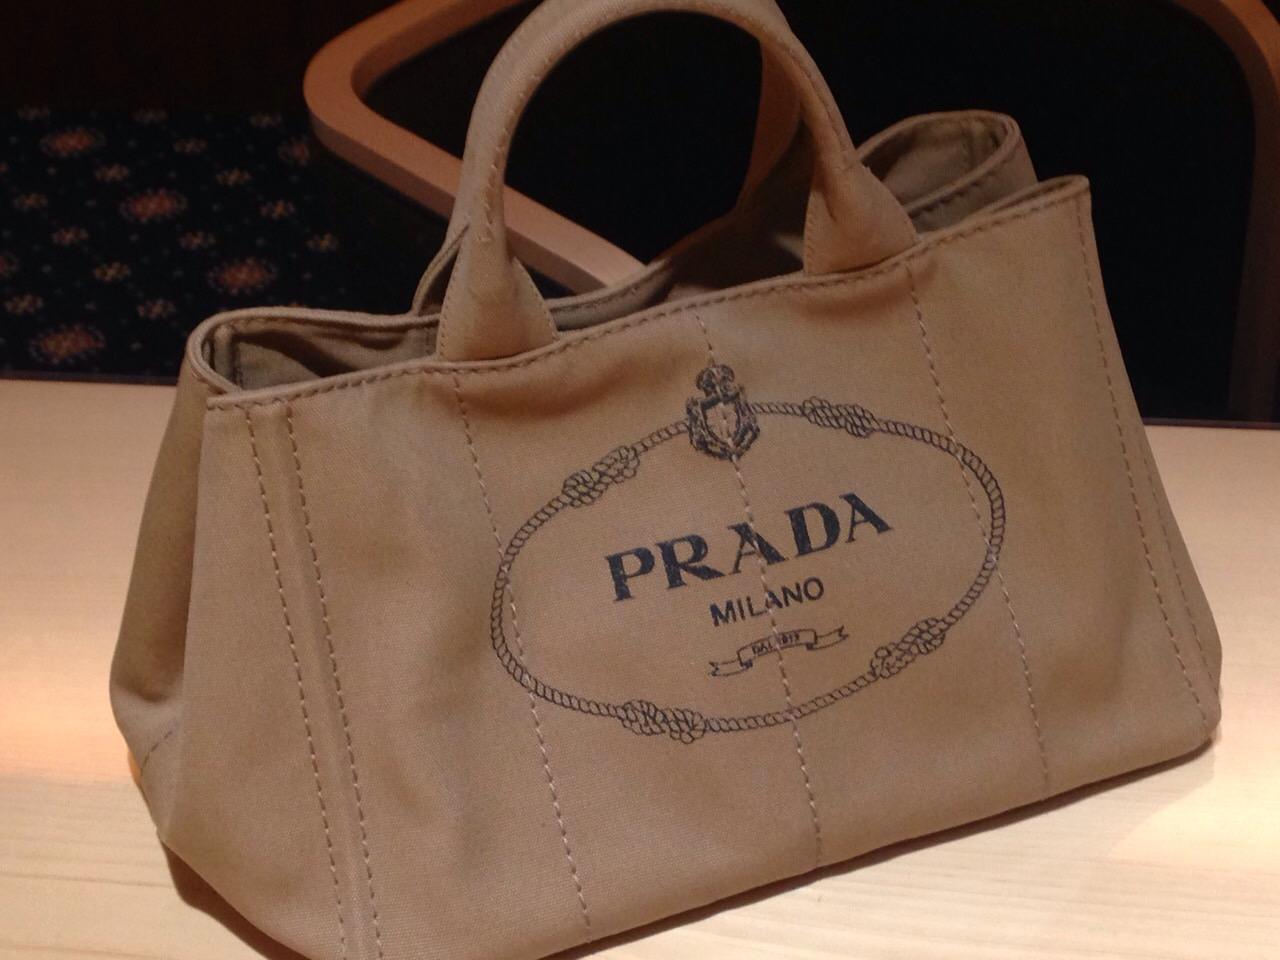 PRADA プラダ カナパトートバッグ キャンバス ブラウン 美品